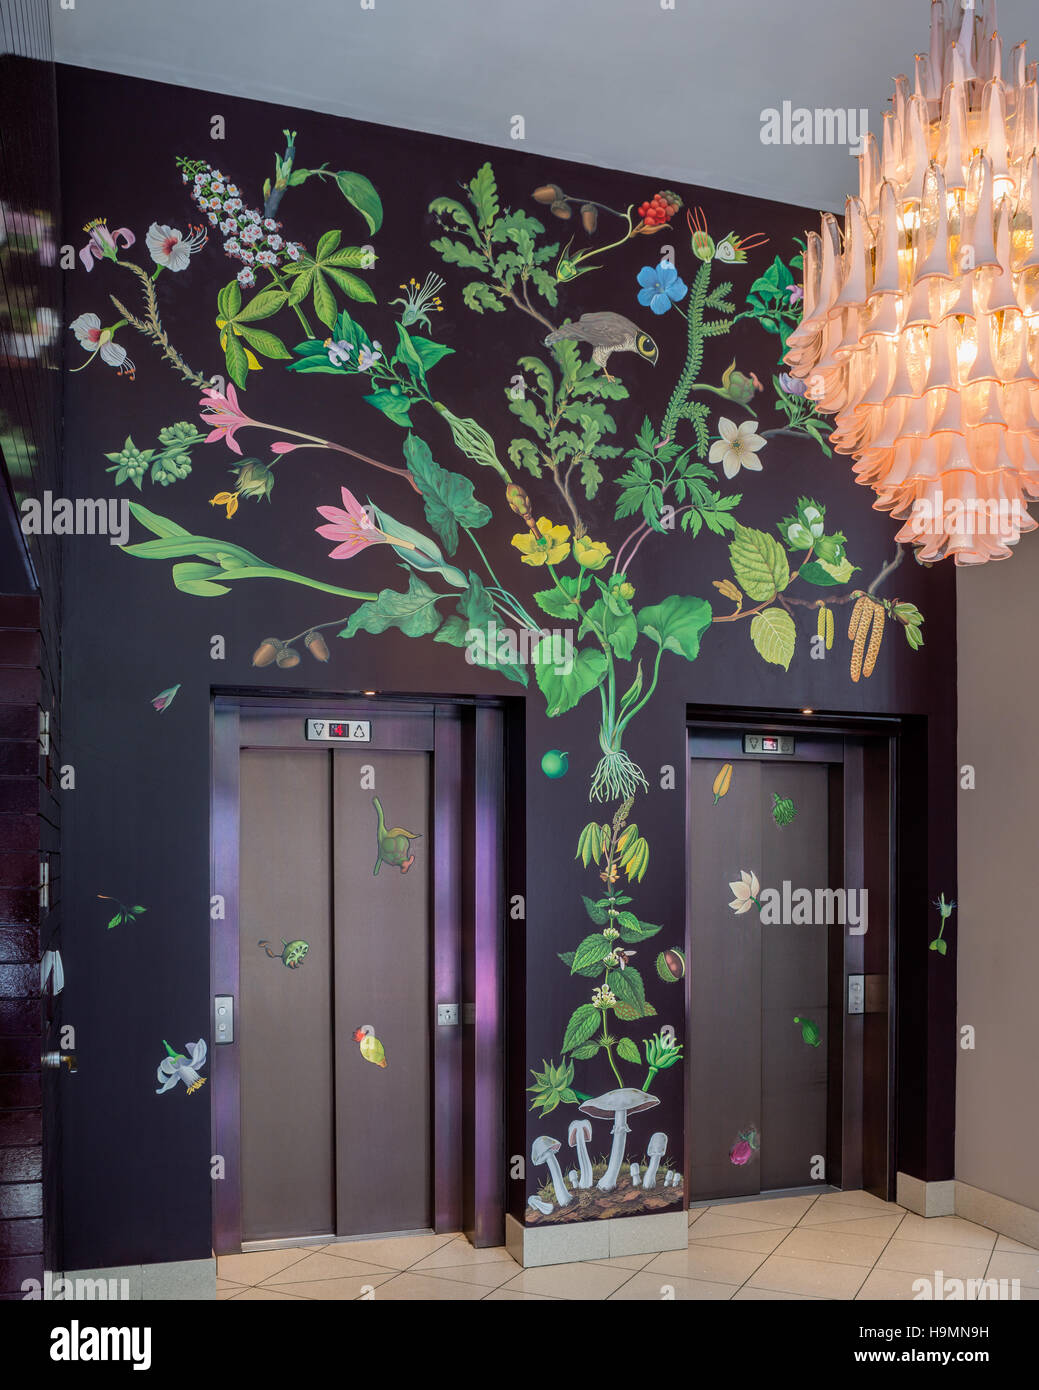 Lift access in foyer of Zetta hotel, London, UK Zetter hotel, Clerkenwell, London, UK - Stock Image